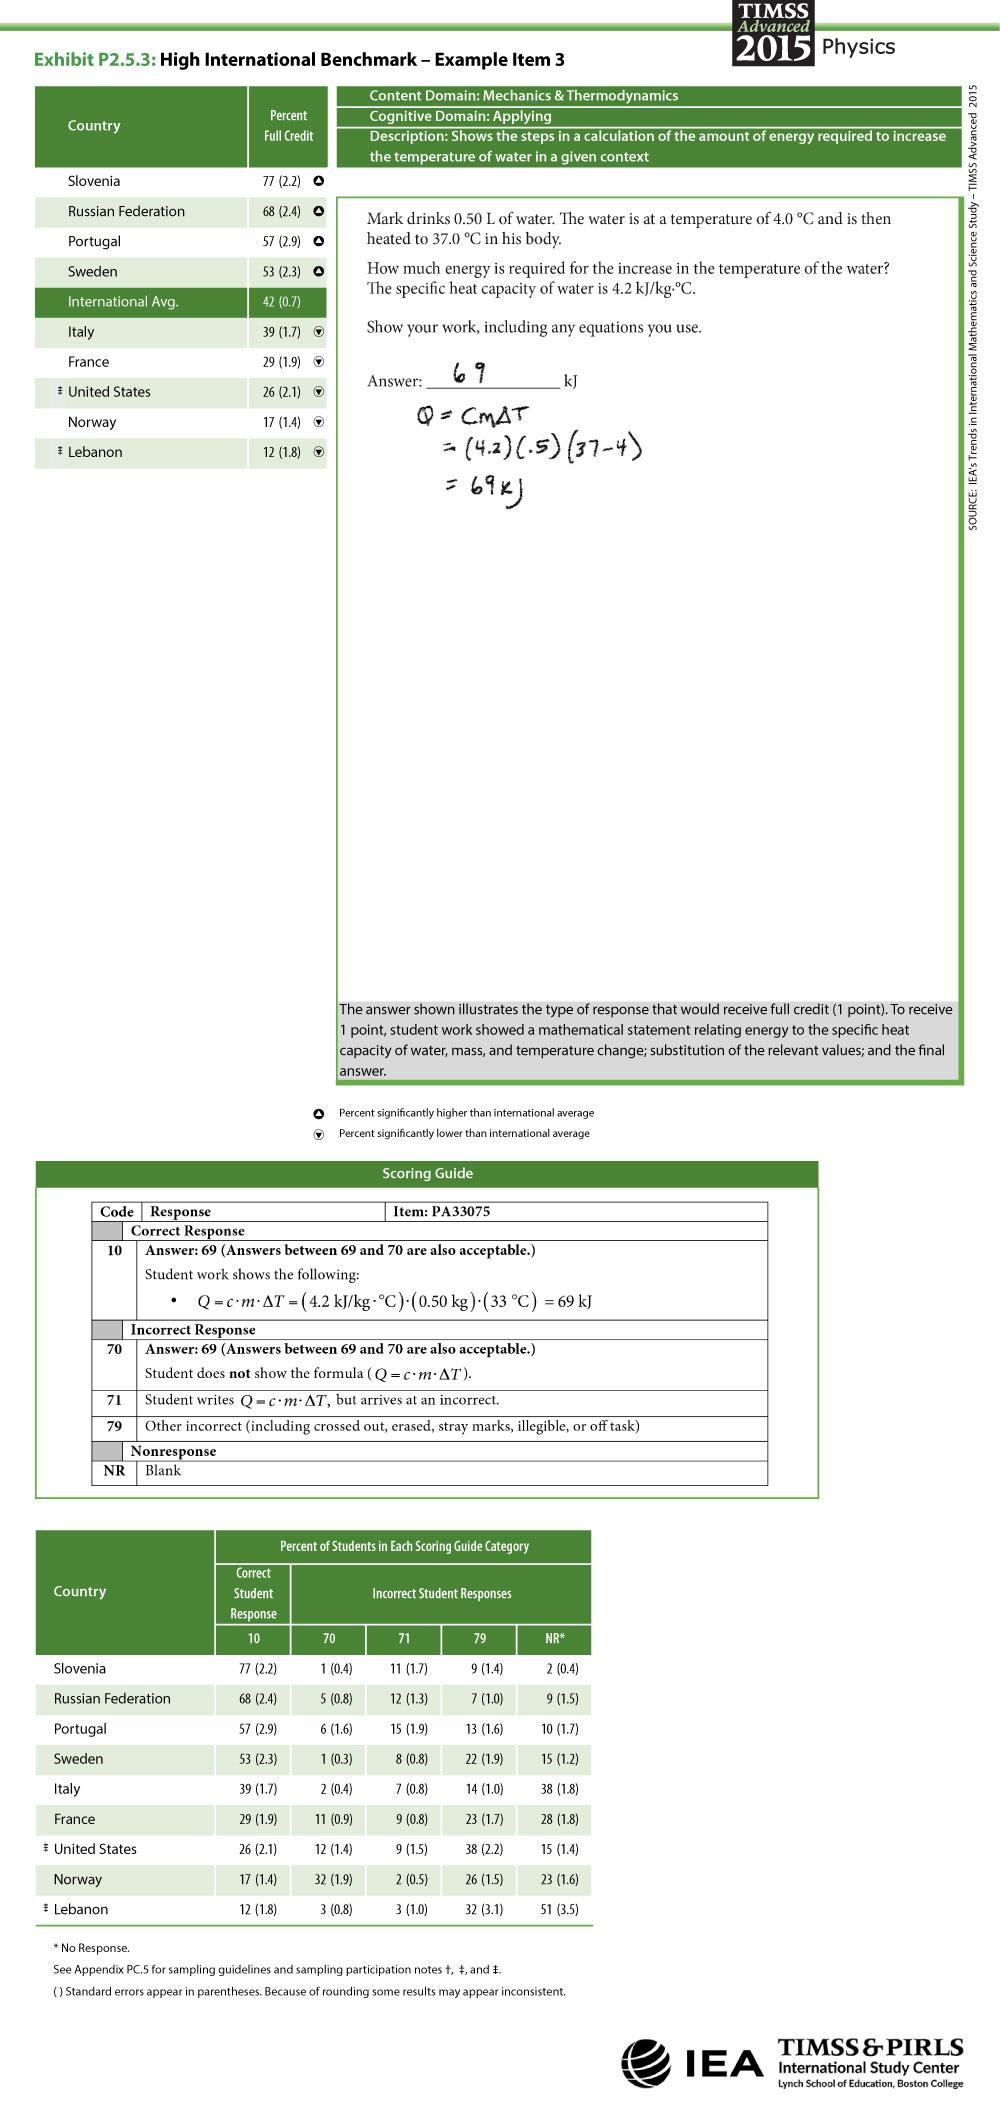 High International Benchmark Item 3